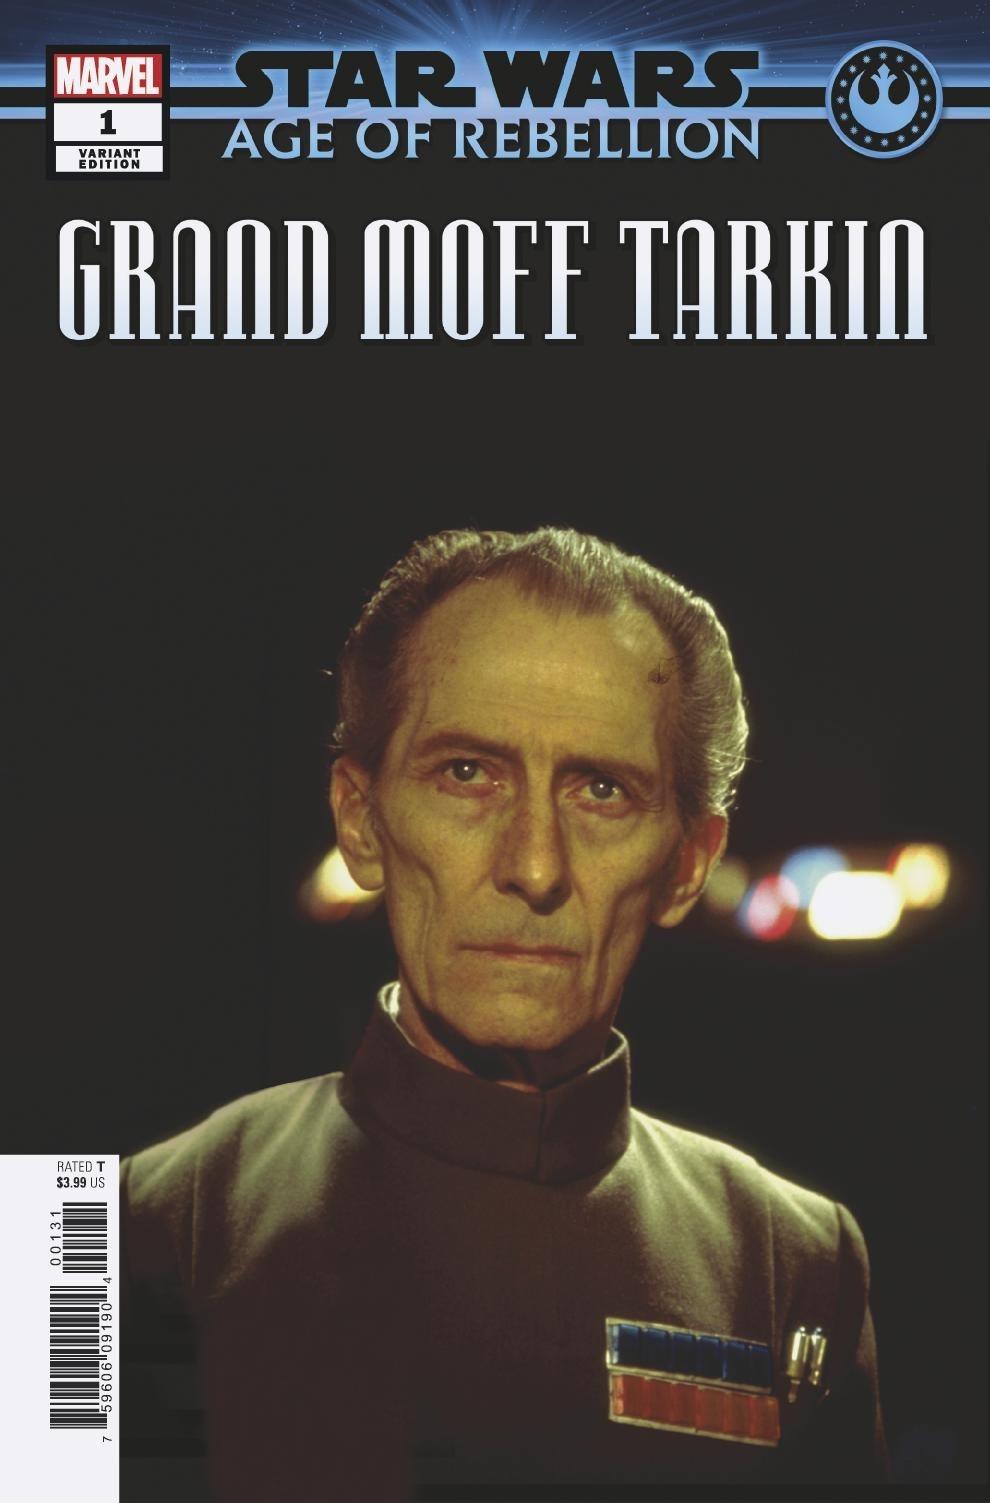 Age of Rebellion: Grand Moff Tarkin #1 (Movie Variant Cover) (10.04.2019)